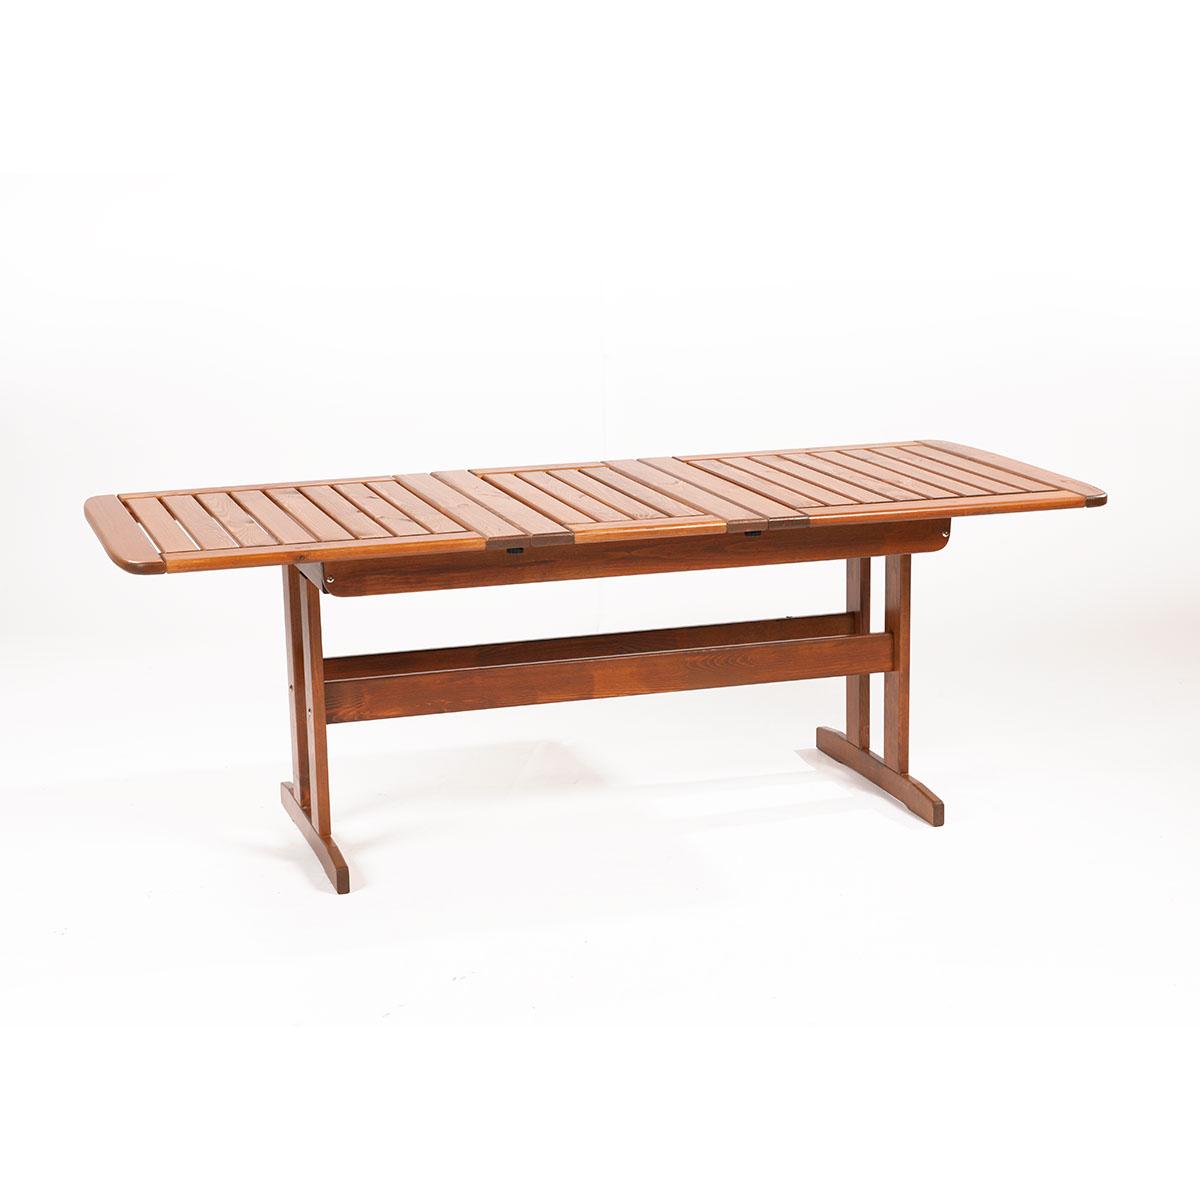 Garland Skeppsvik, rozkladatelný zahradní stůl z borovice 160/210 x 88 x 73 cm